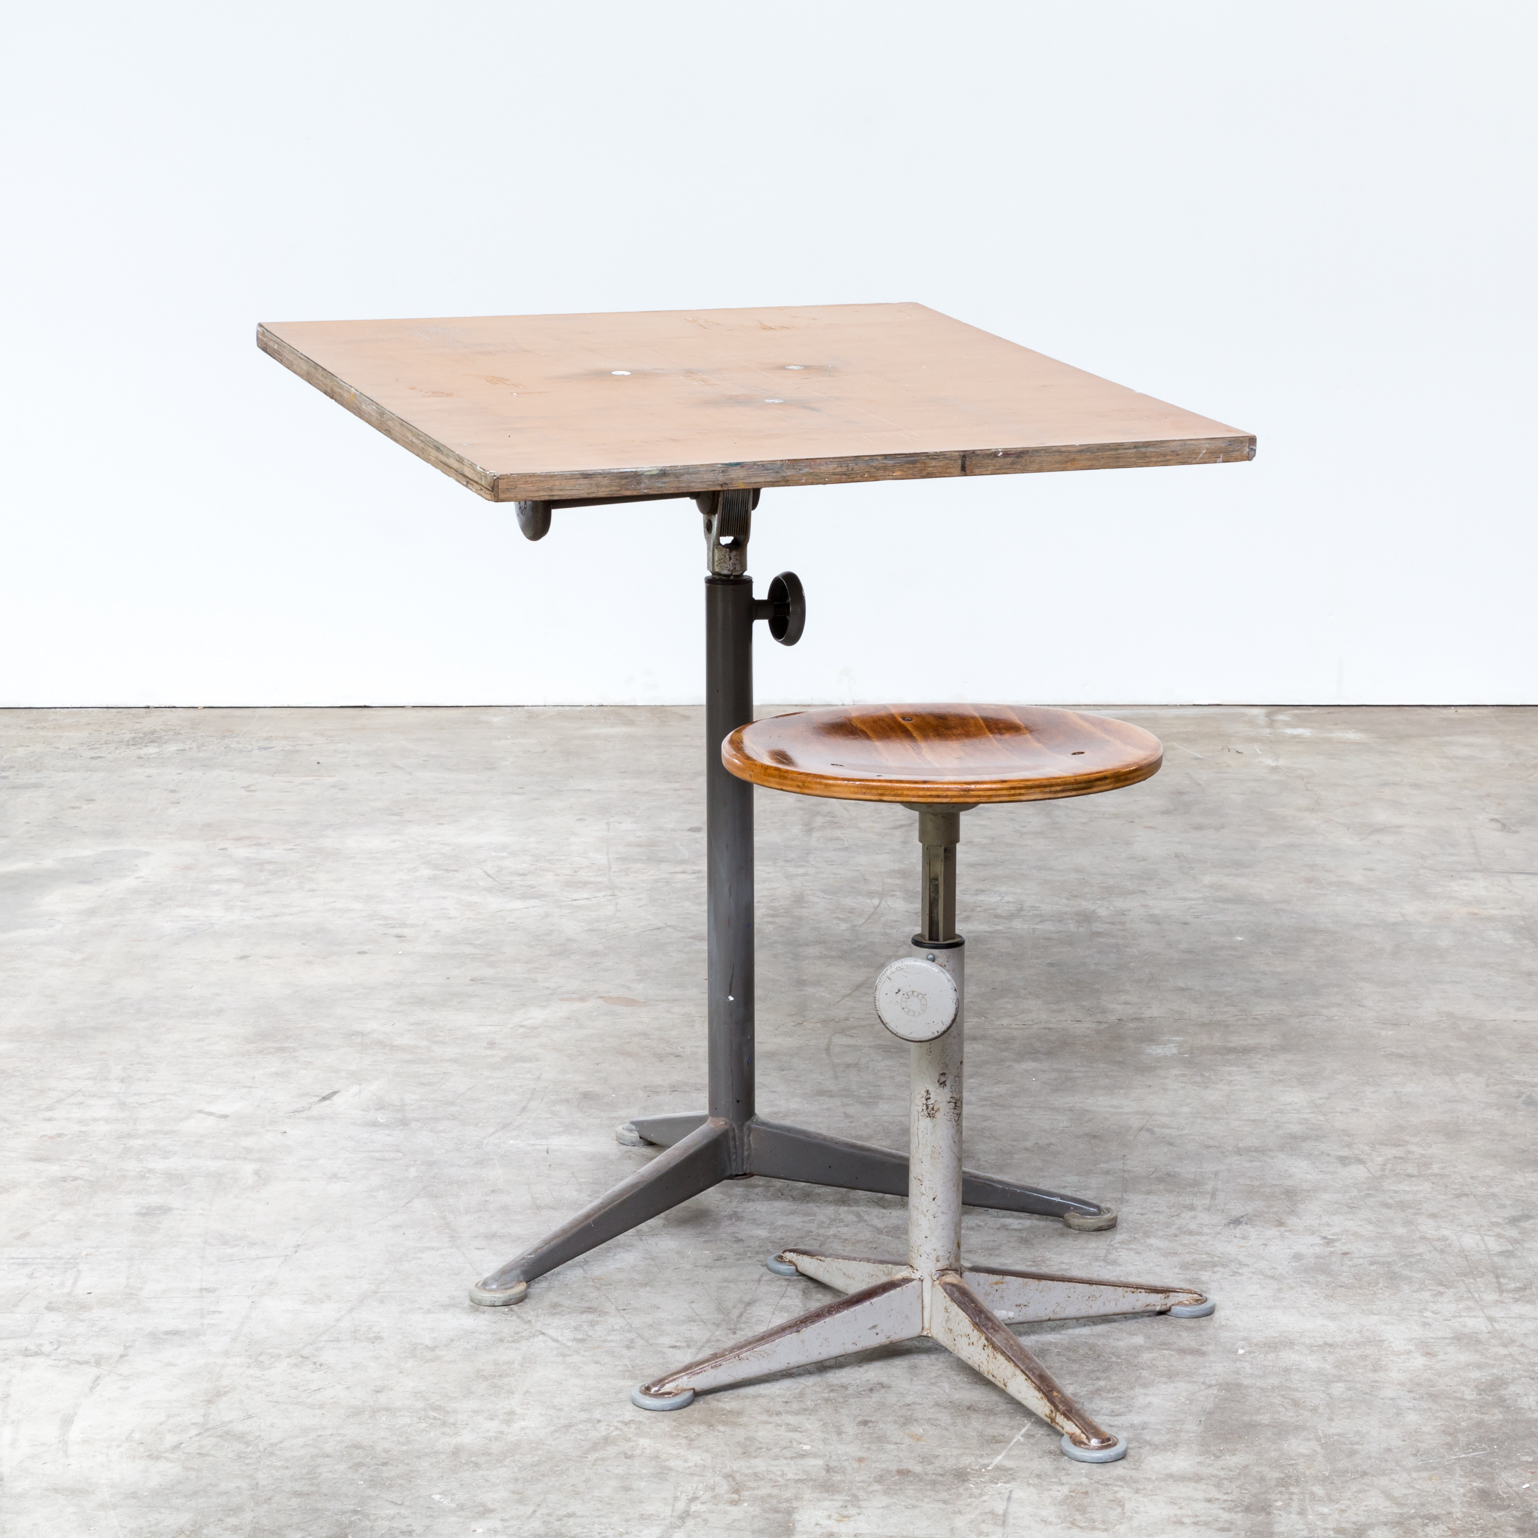 1964 Rare Friso Kramer Coffee Table For Ahrend De Cirkel: Friso Kramer Drawing Table For Ahrend De Cirkel